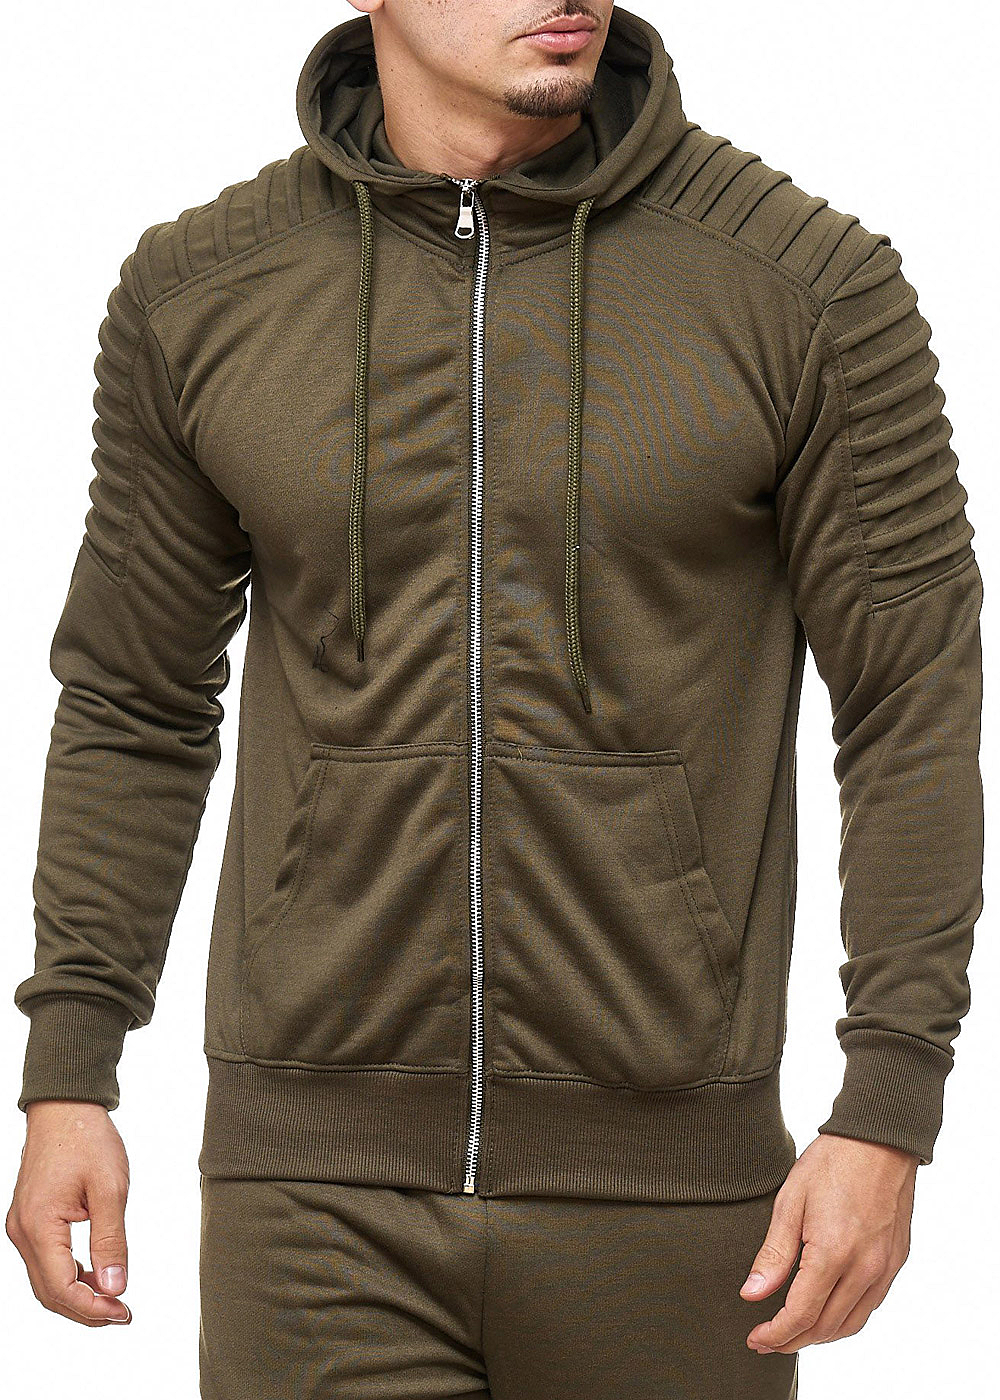 seventyseven lifestyle herren zip hoodie 2 taschen khaki 77onlineshop. Black Bedroom Furniture Sets. Home Design Ideas